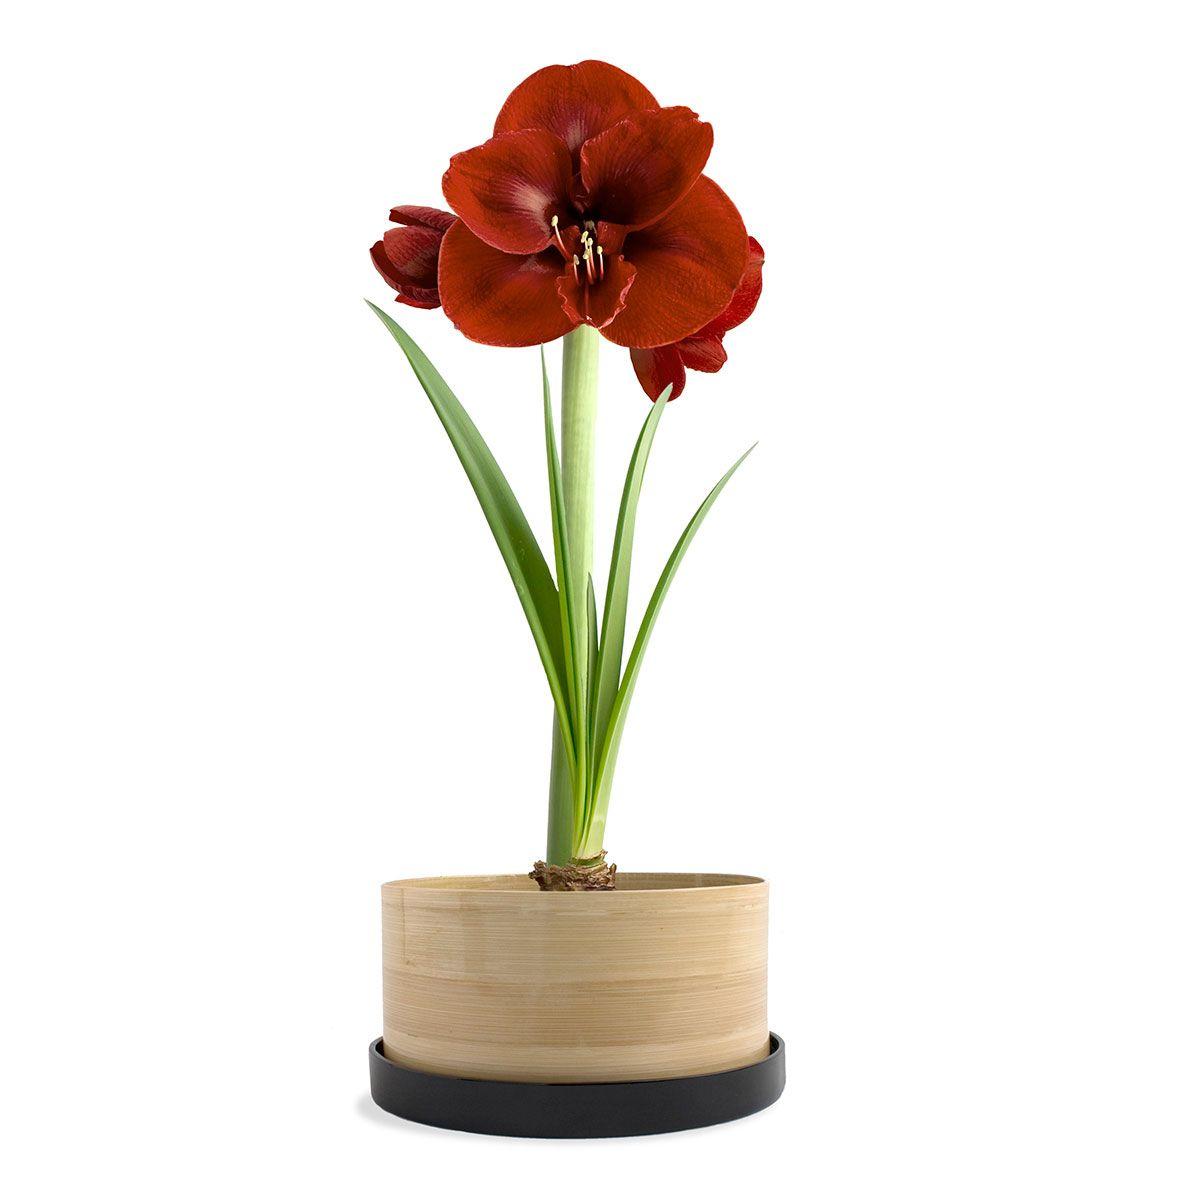 Chocolate Amaryllis Bamboo Grow Pot   Organic Home And Garden   USA Made Home  And Garden